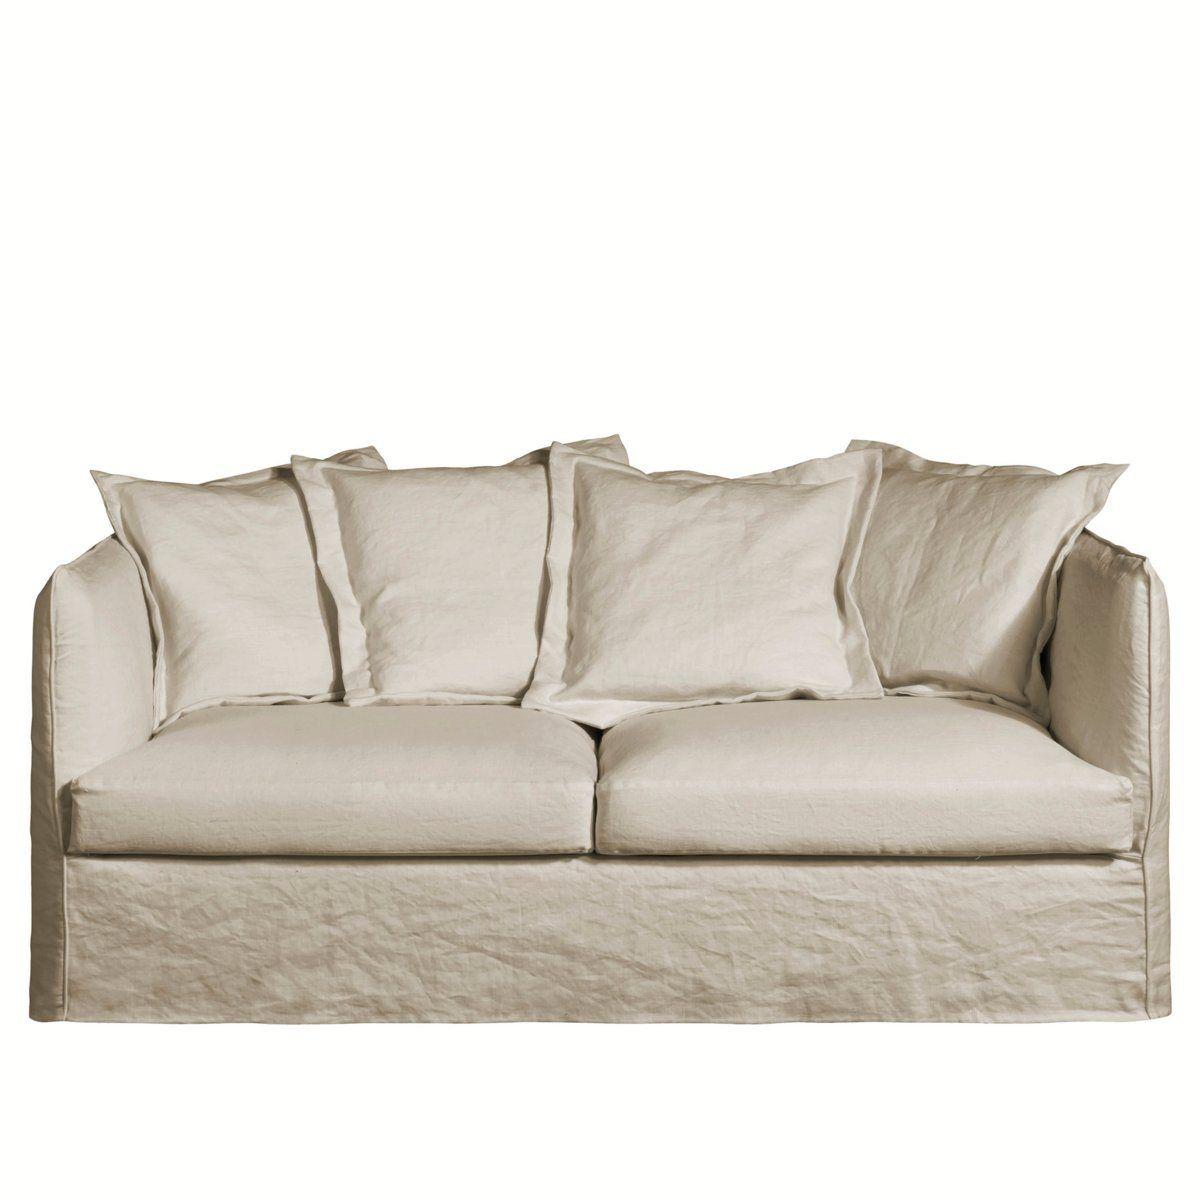 fauteuil cuir veilli barnaby convertible. Black Bedroom Furniture Sets. Home Design Ideas